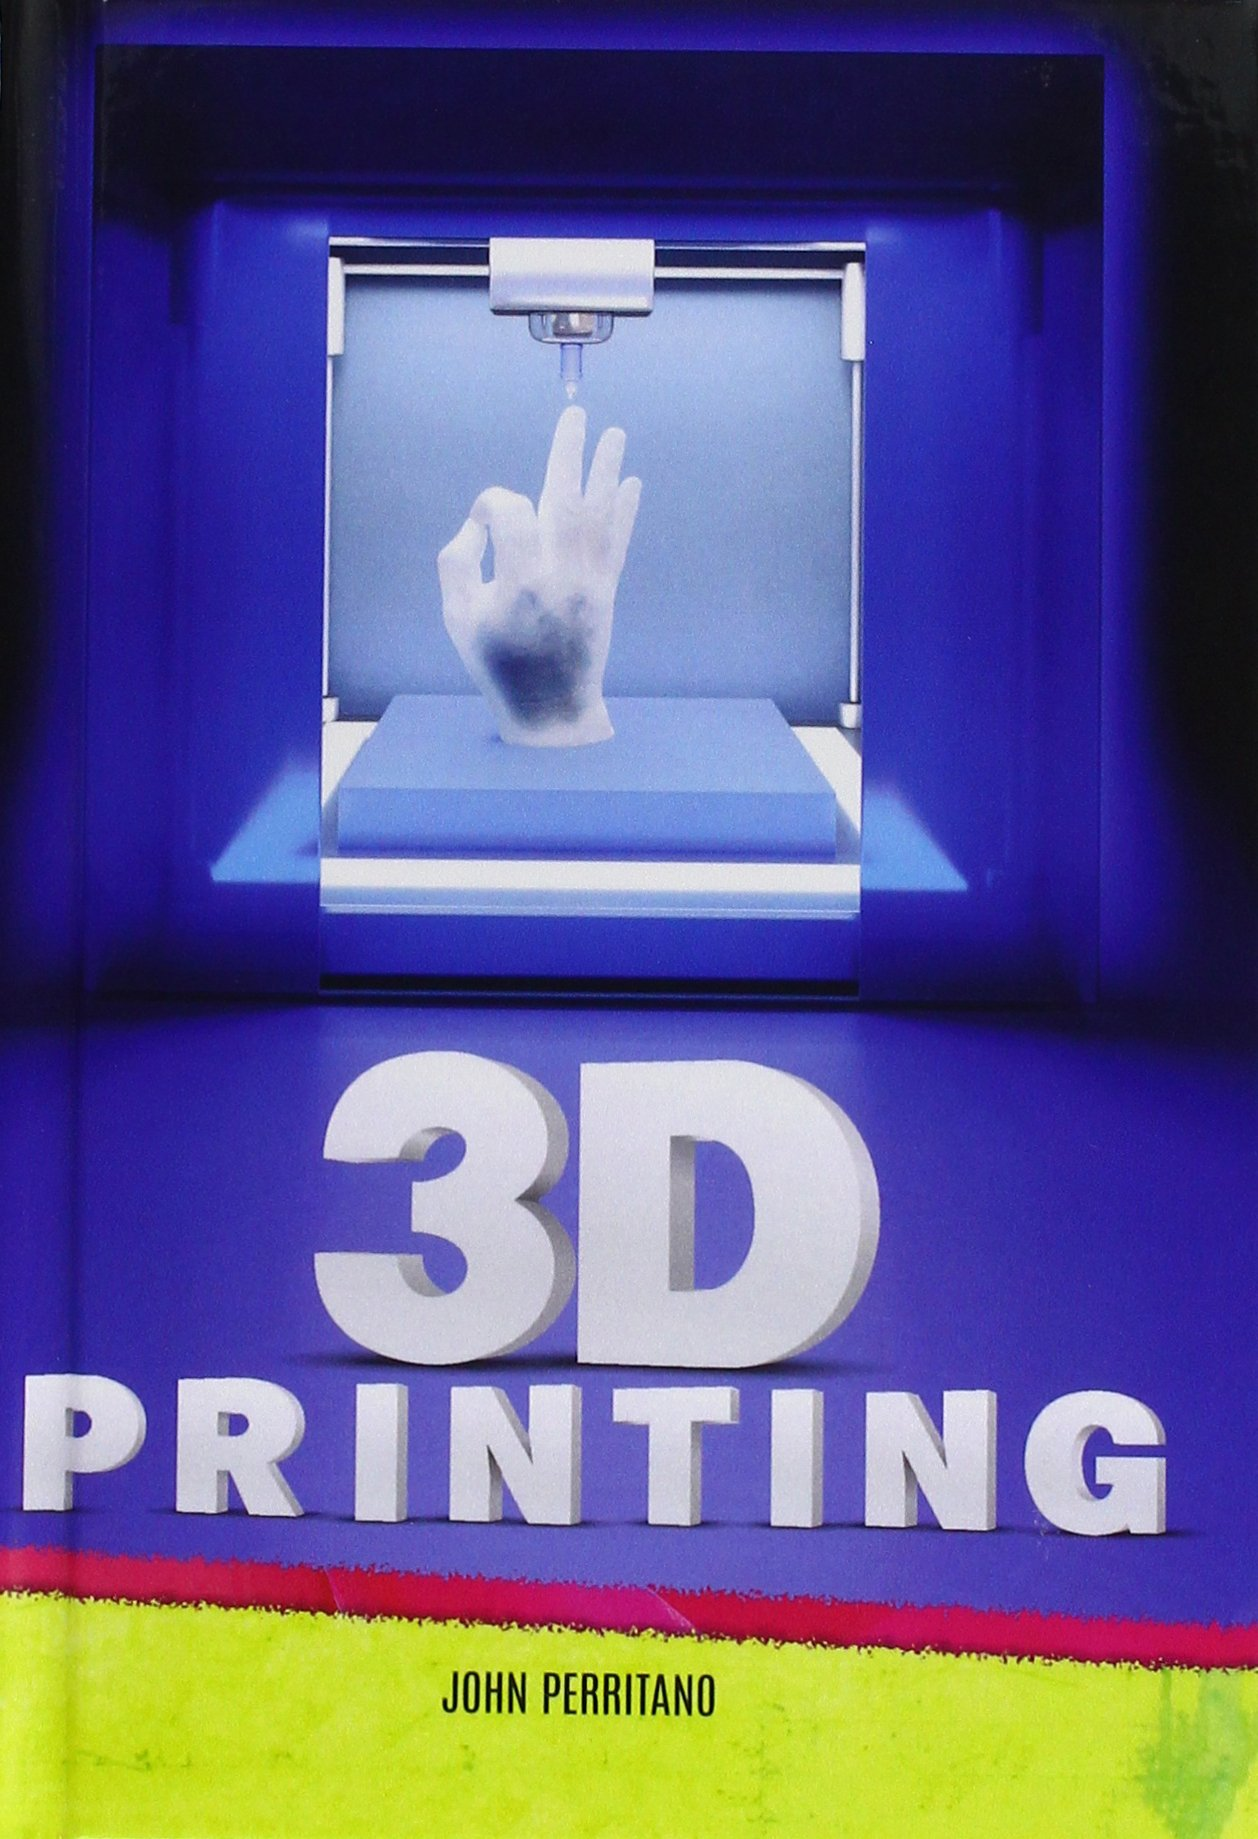 3D Printing (Turtleback School & Library Binding Edition)